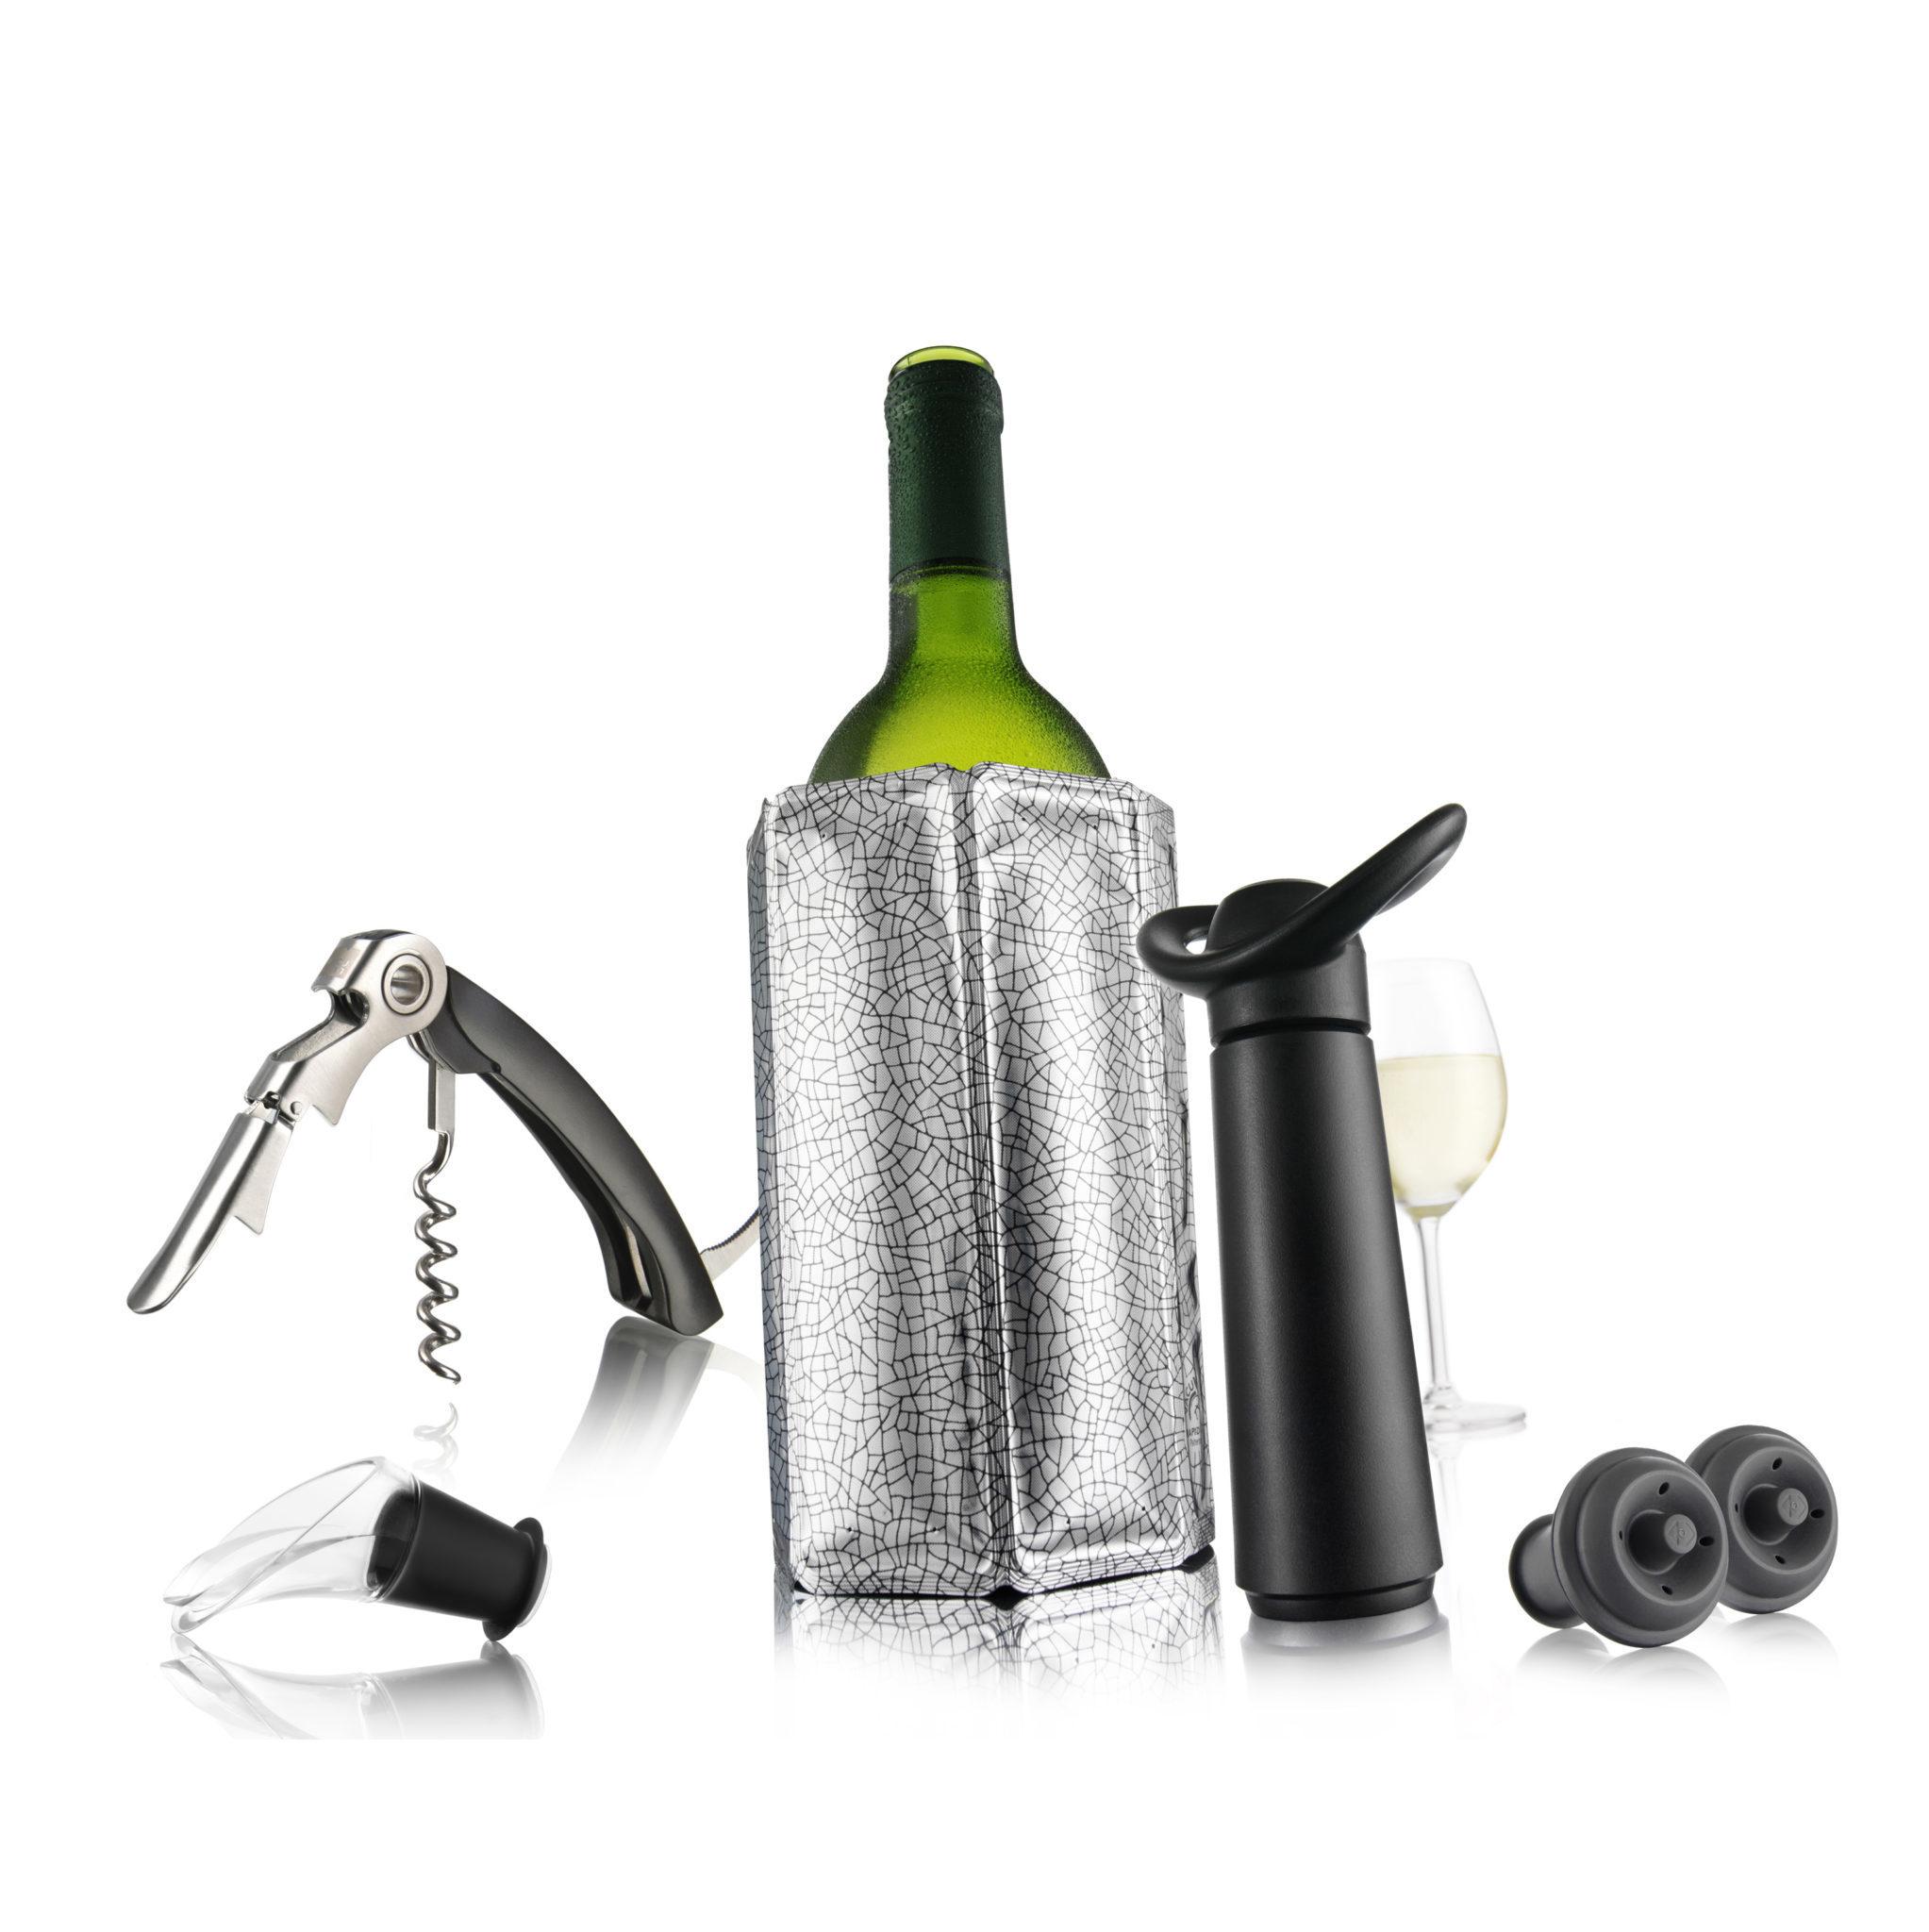 Фото - Подарочный набор для вина Essentials подарочный набор giftset wine essentials 6 пр 6889060 vacuvin